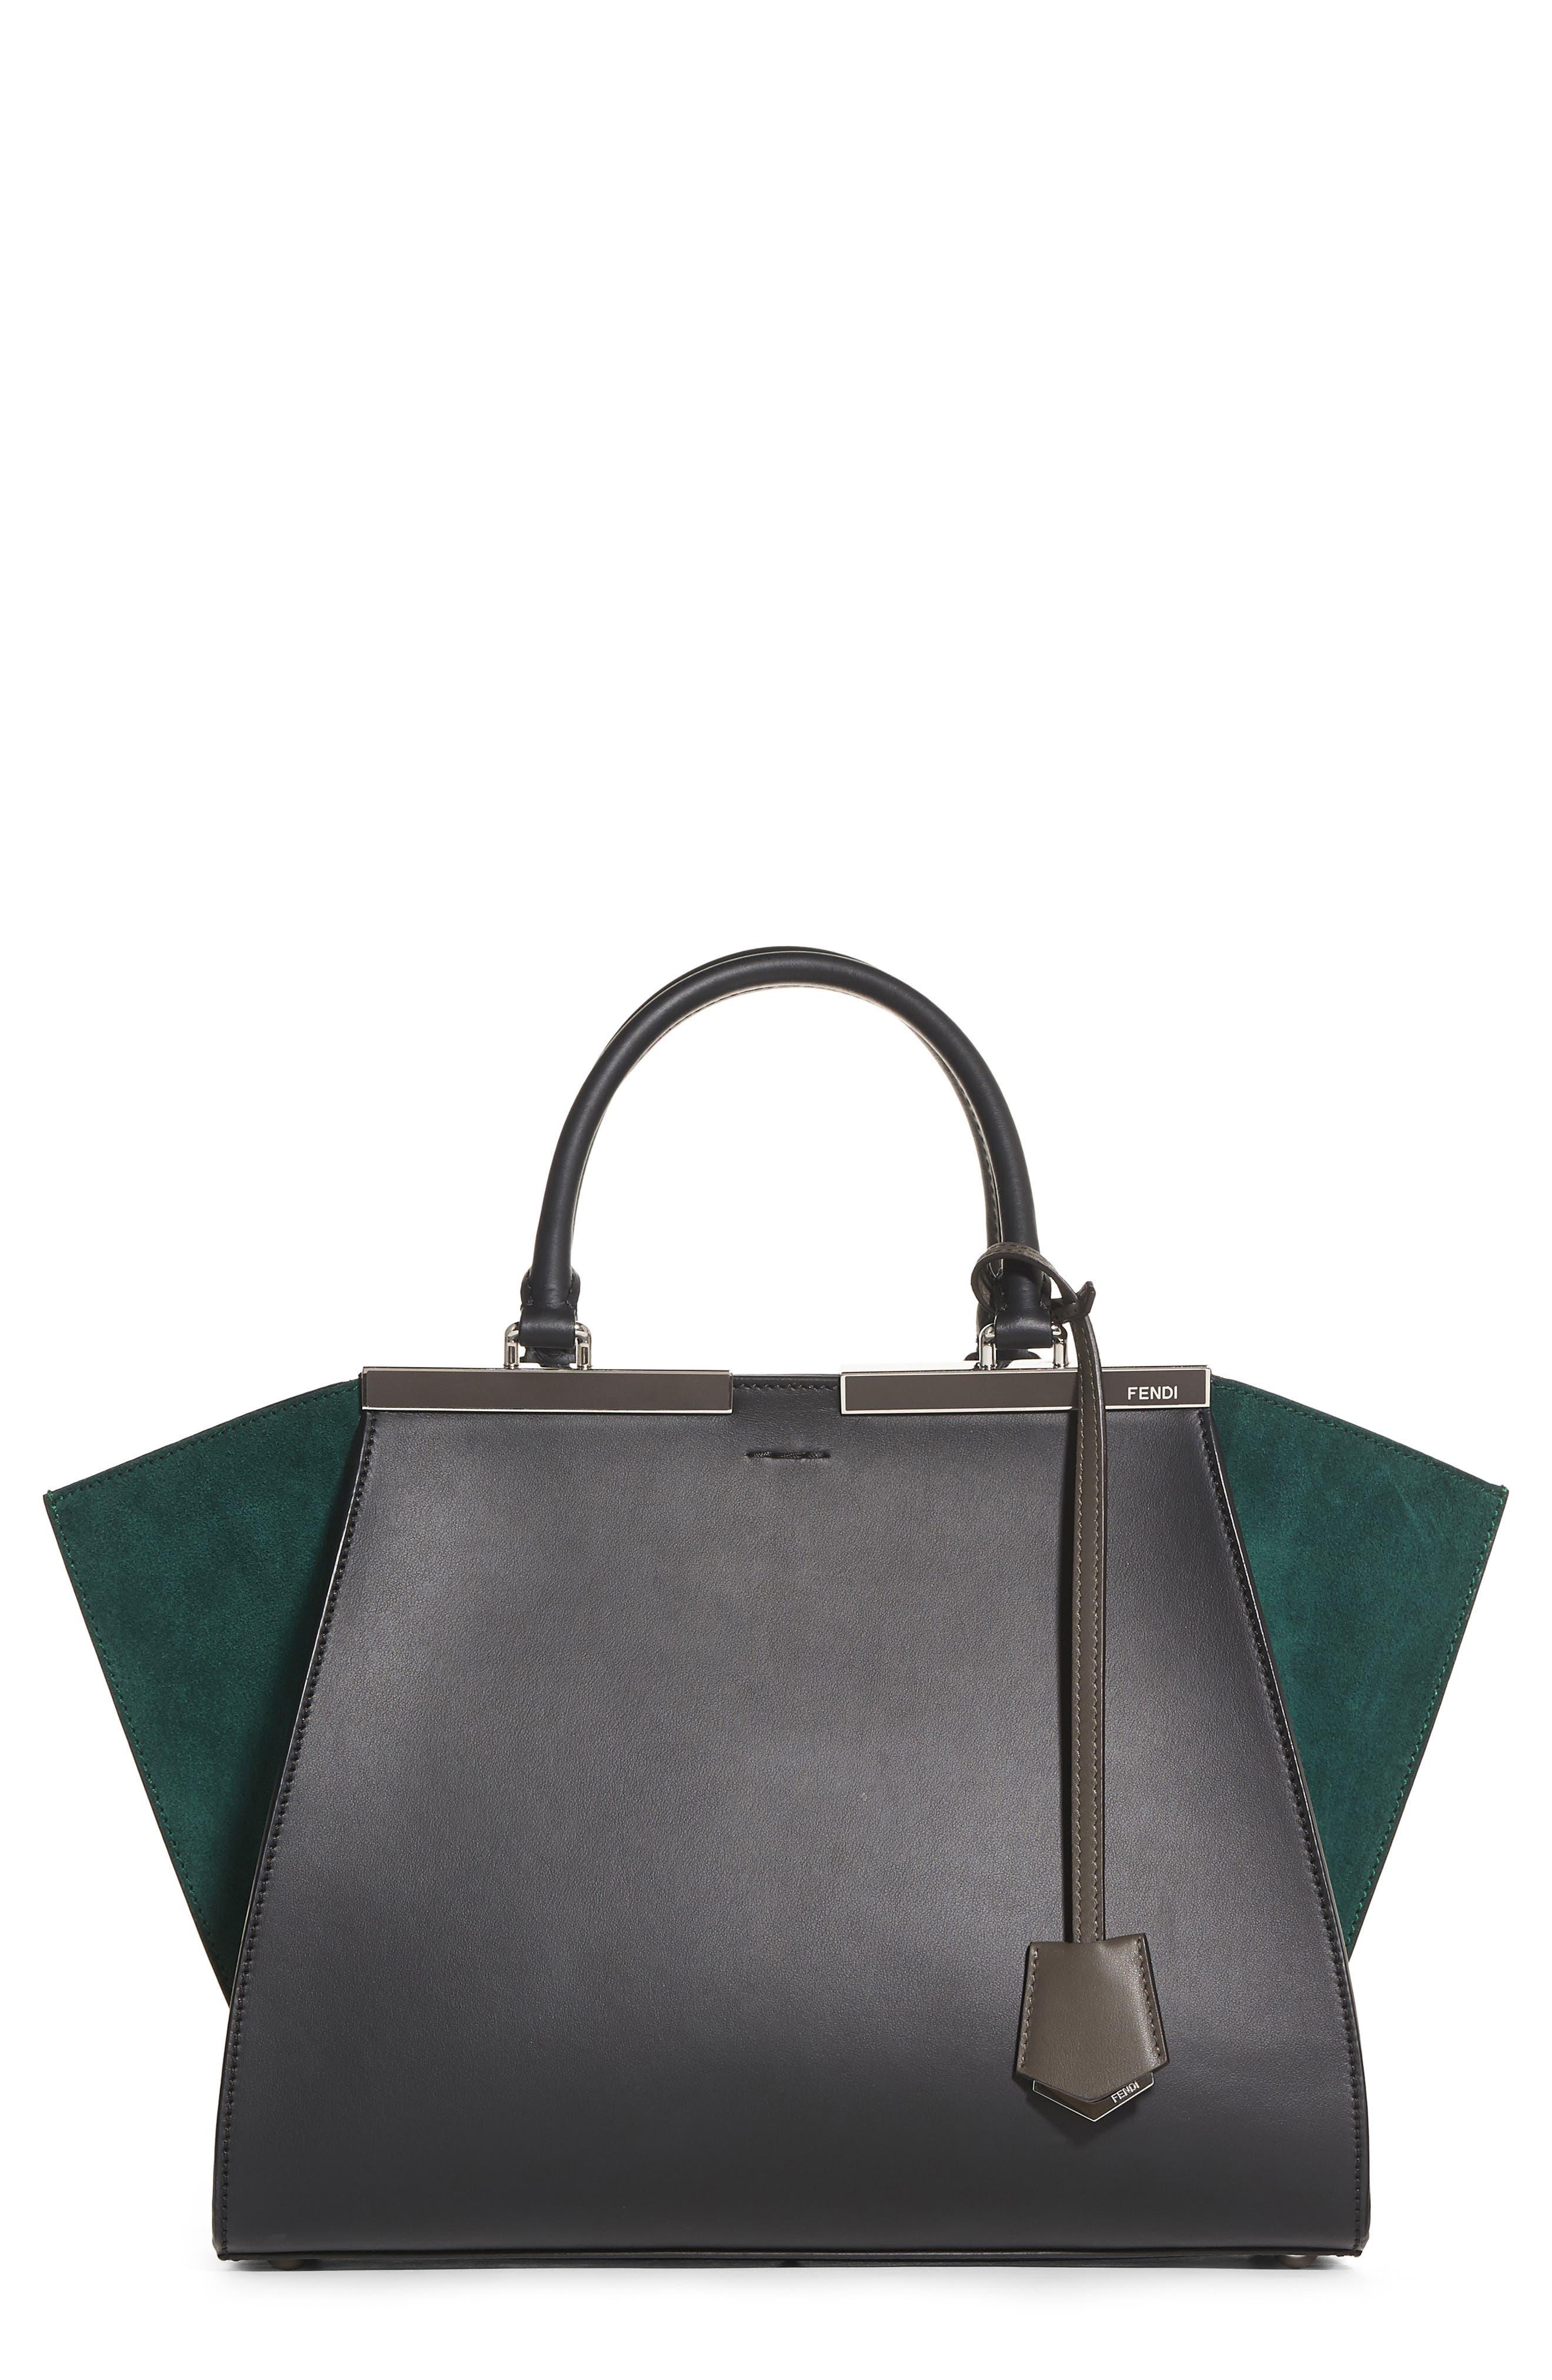 Fendi 3Jours Baltico Leather & Suede Shopper